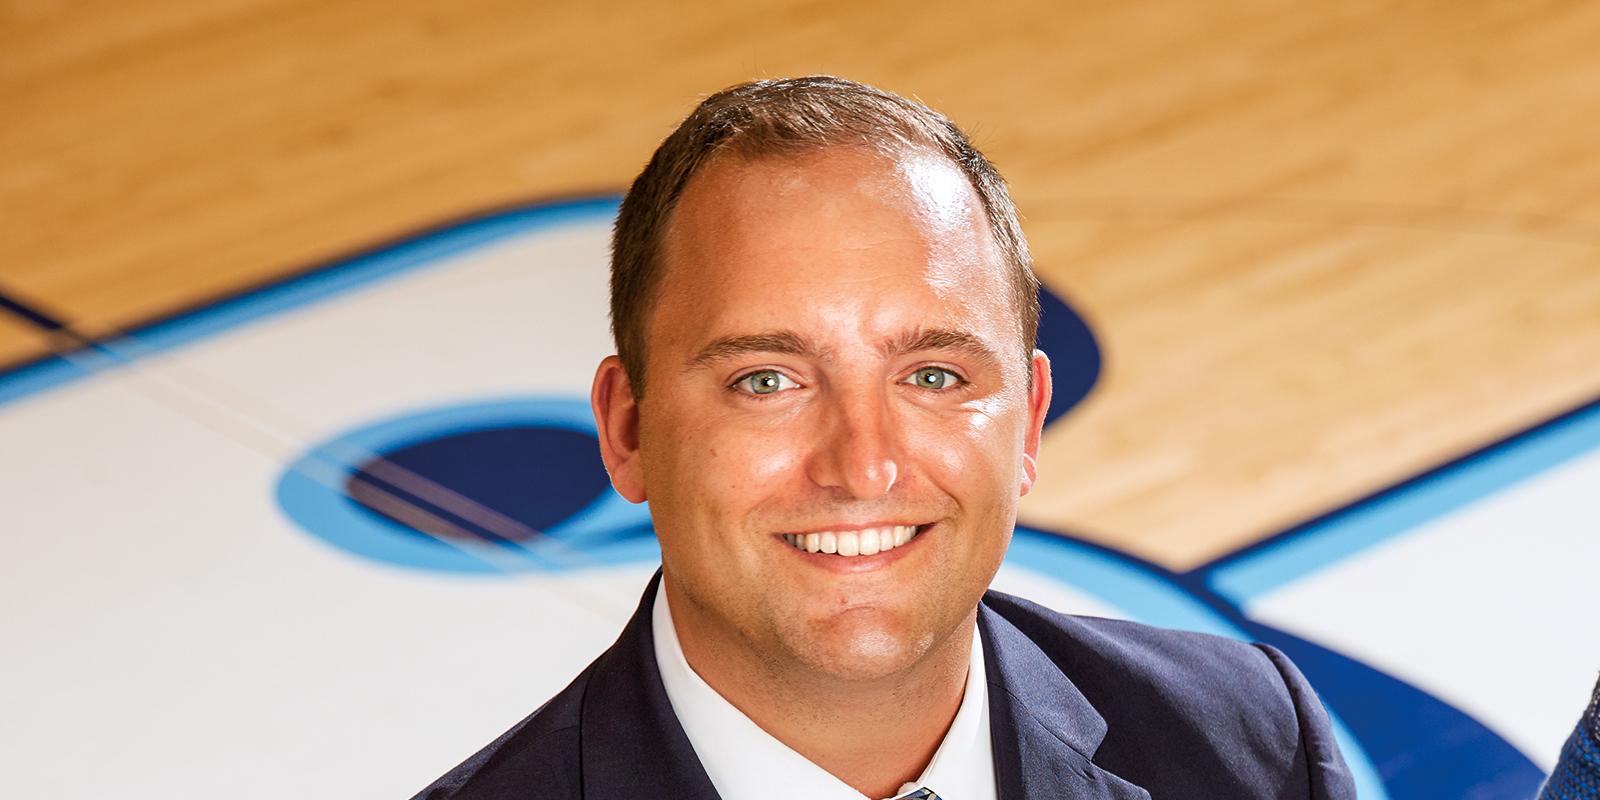 USD senior associate director of athletics for development Tyler Mariucci